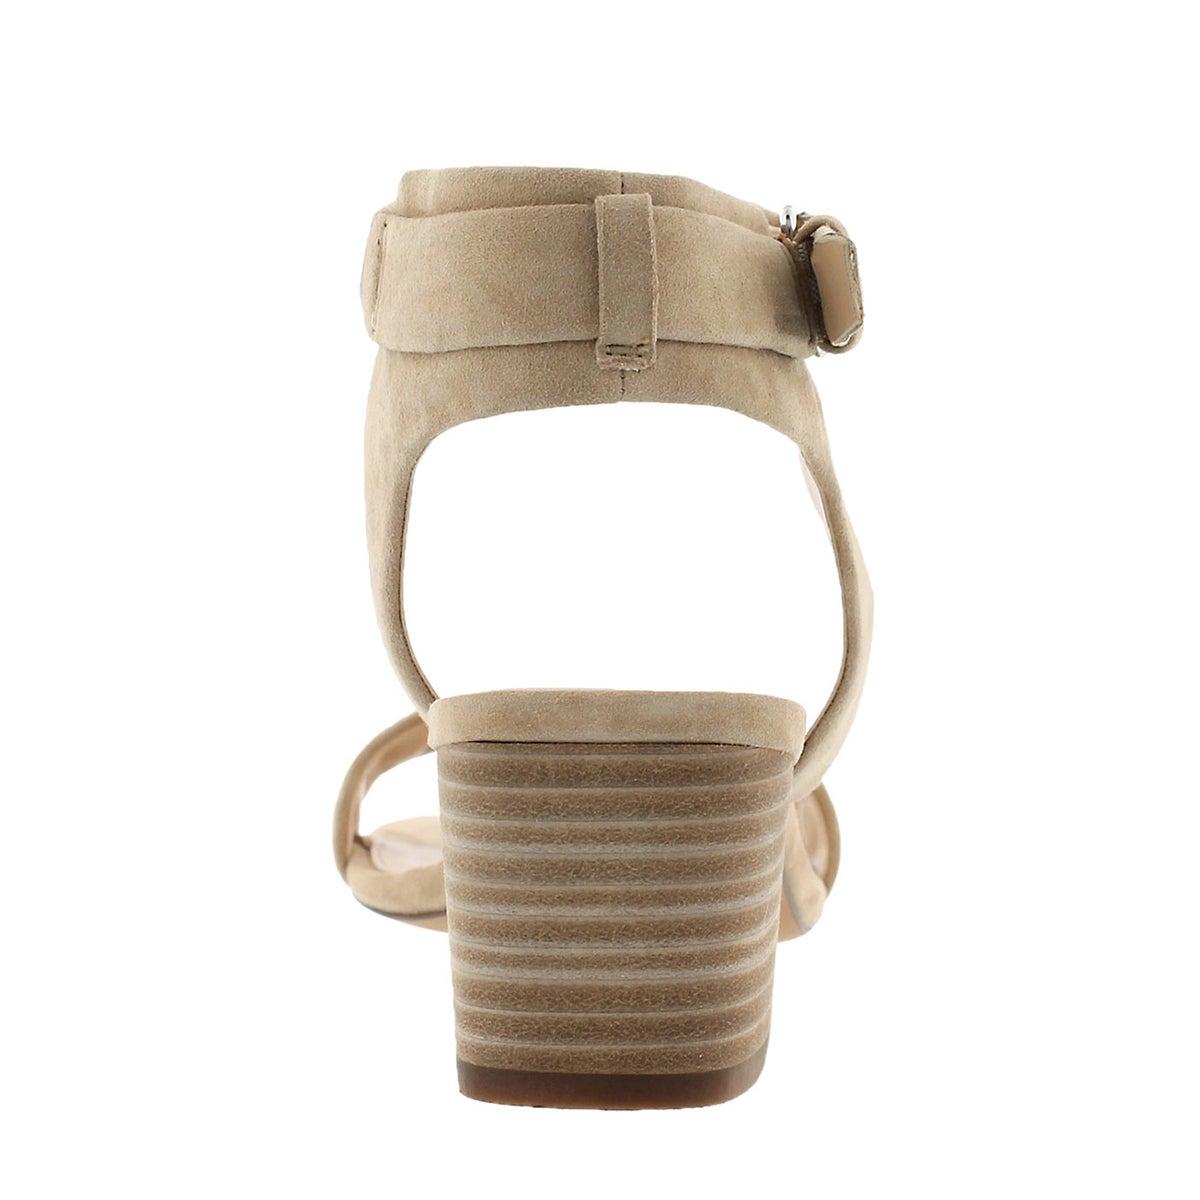 Lds Feya tumbleweed dress sandal